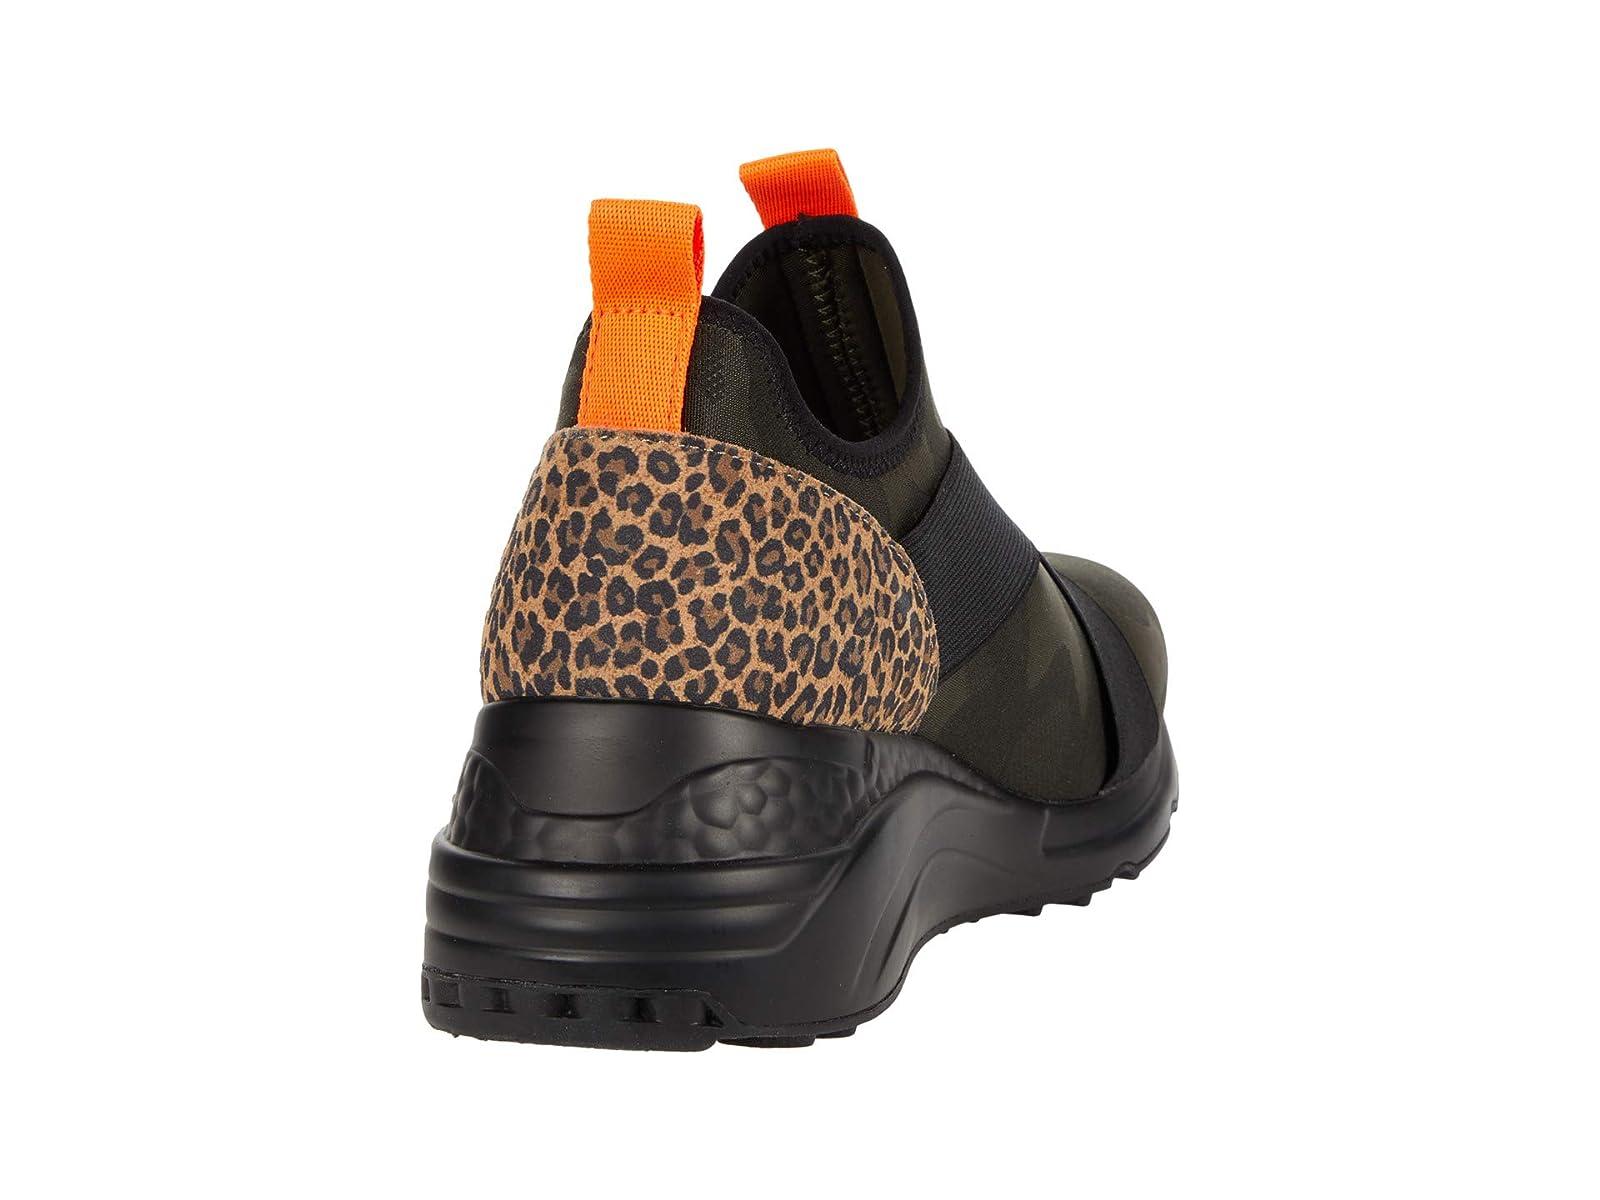 Man's Sneakers & Athletic Shoes Steve Madden Brysonn